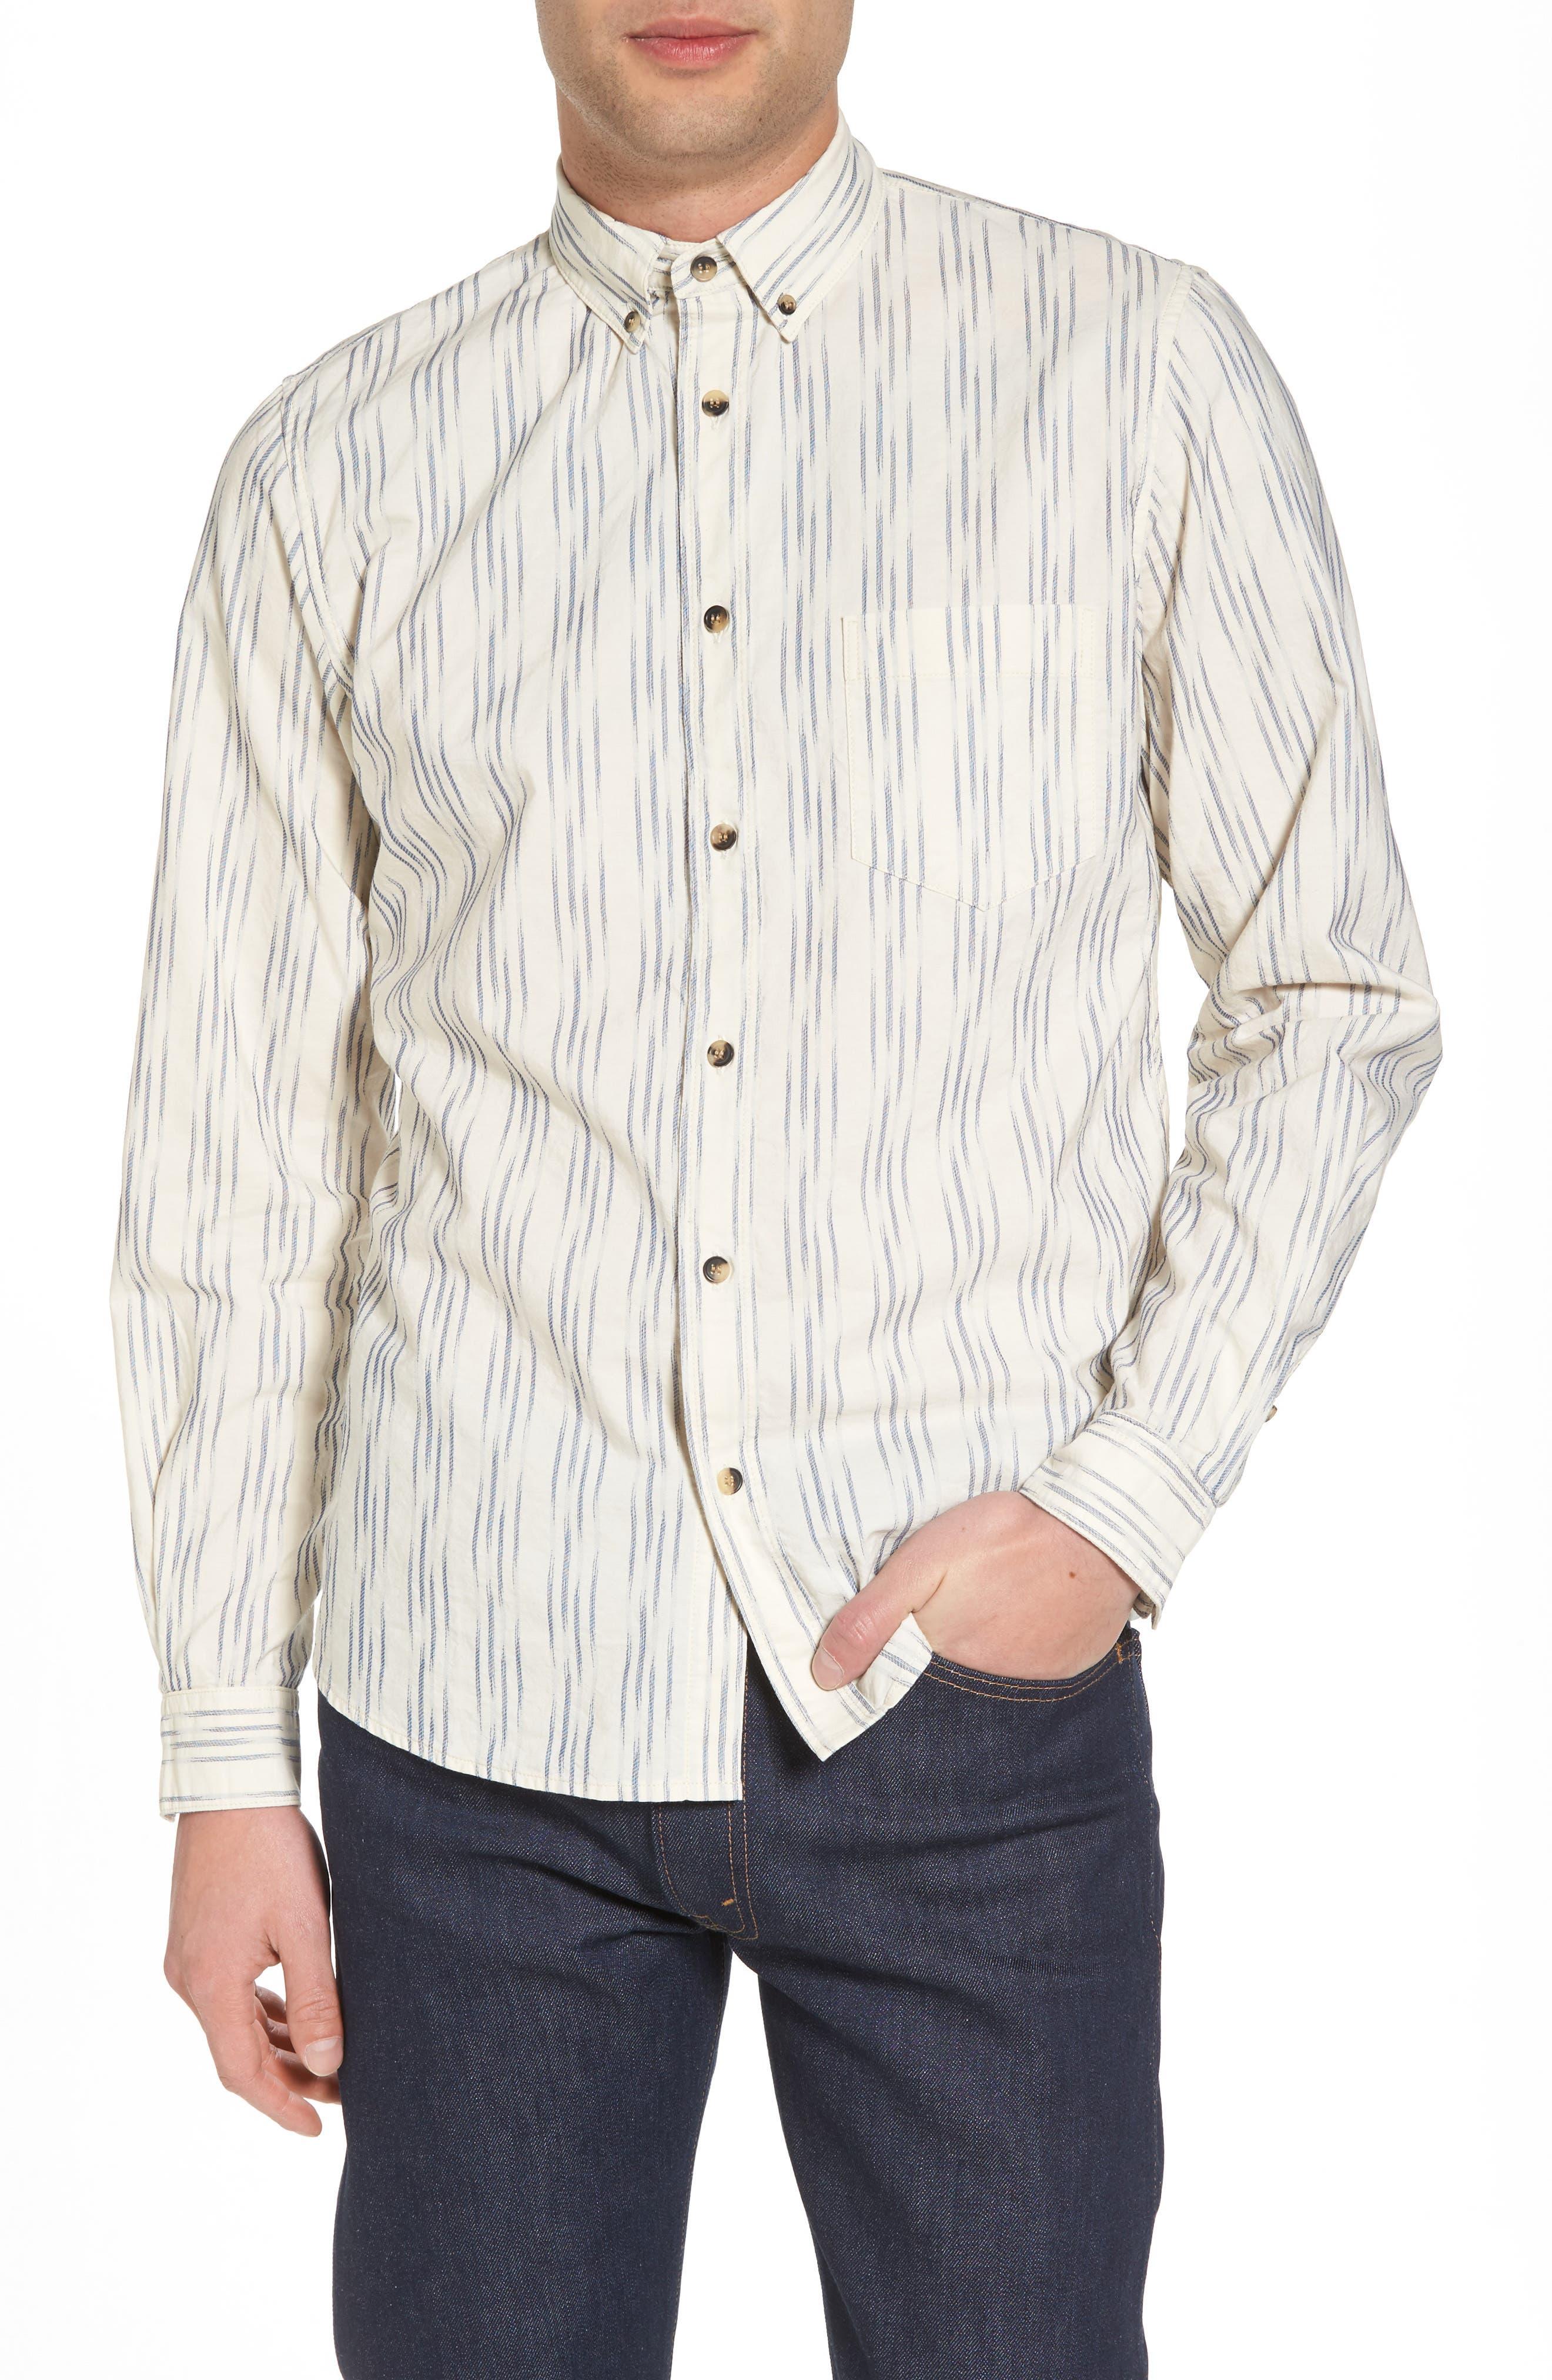 Regular Fit Sport Shirt,                         Main,                         color, Ikat White/Blue